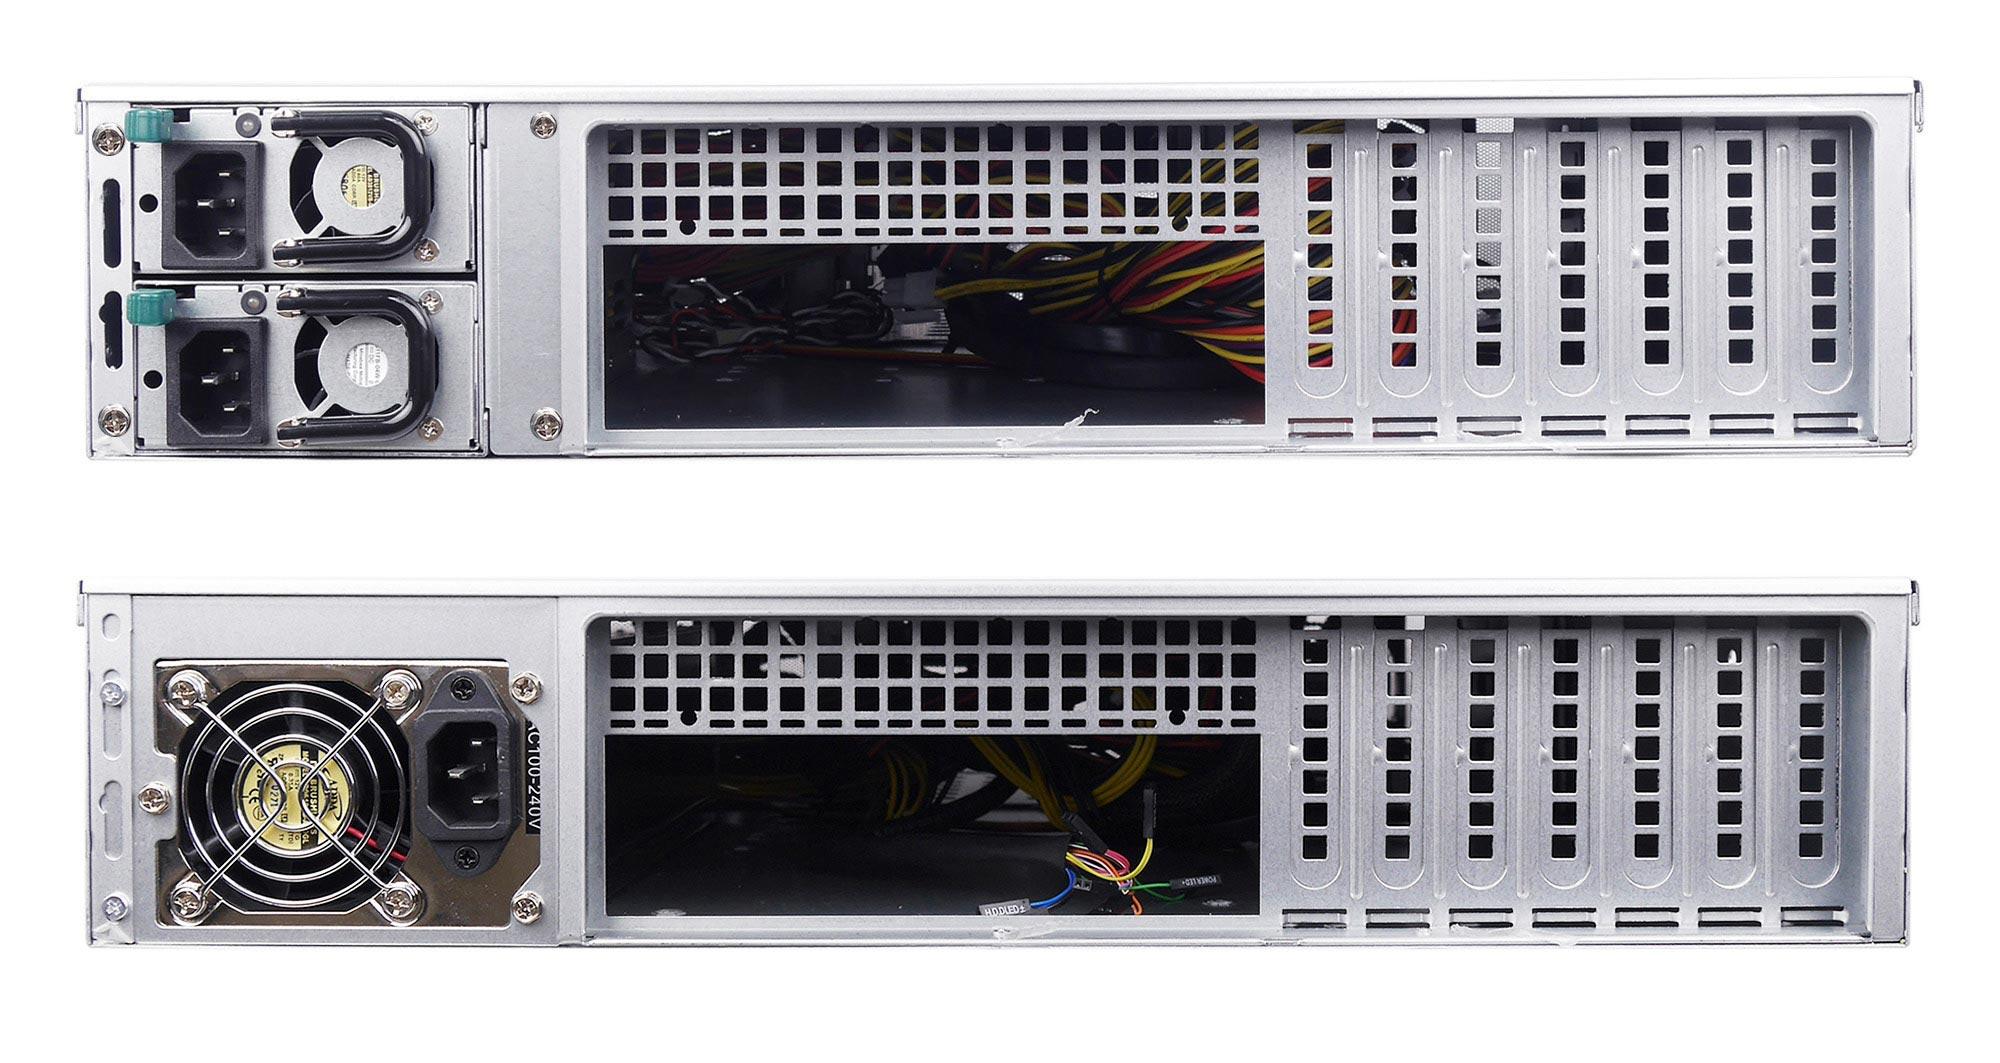 nr-n2442-configuration-1.jpg